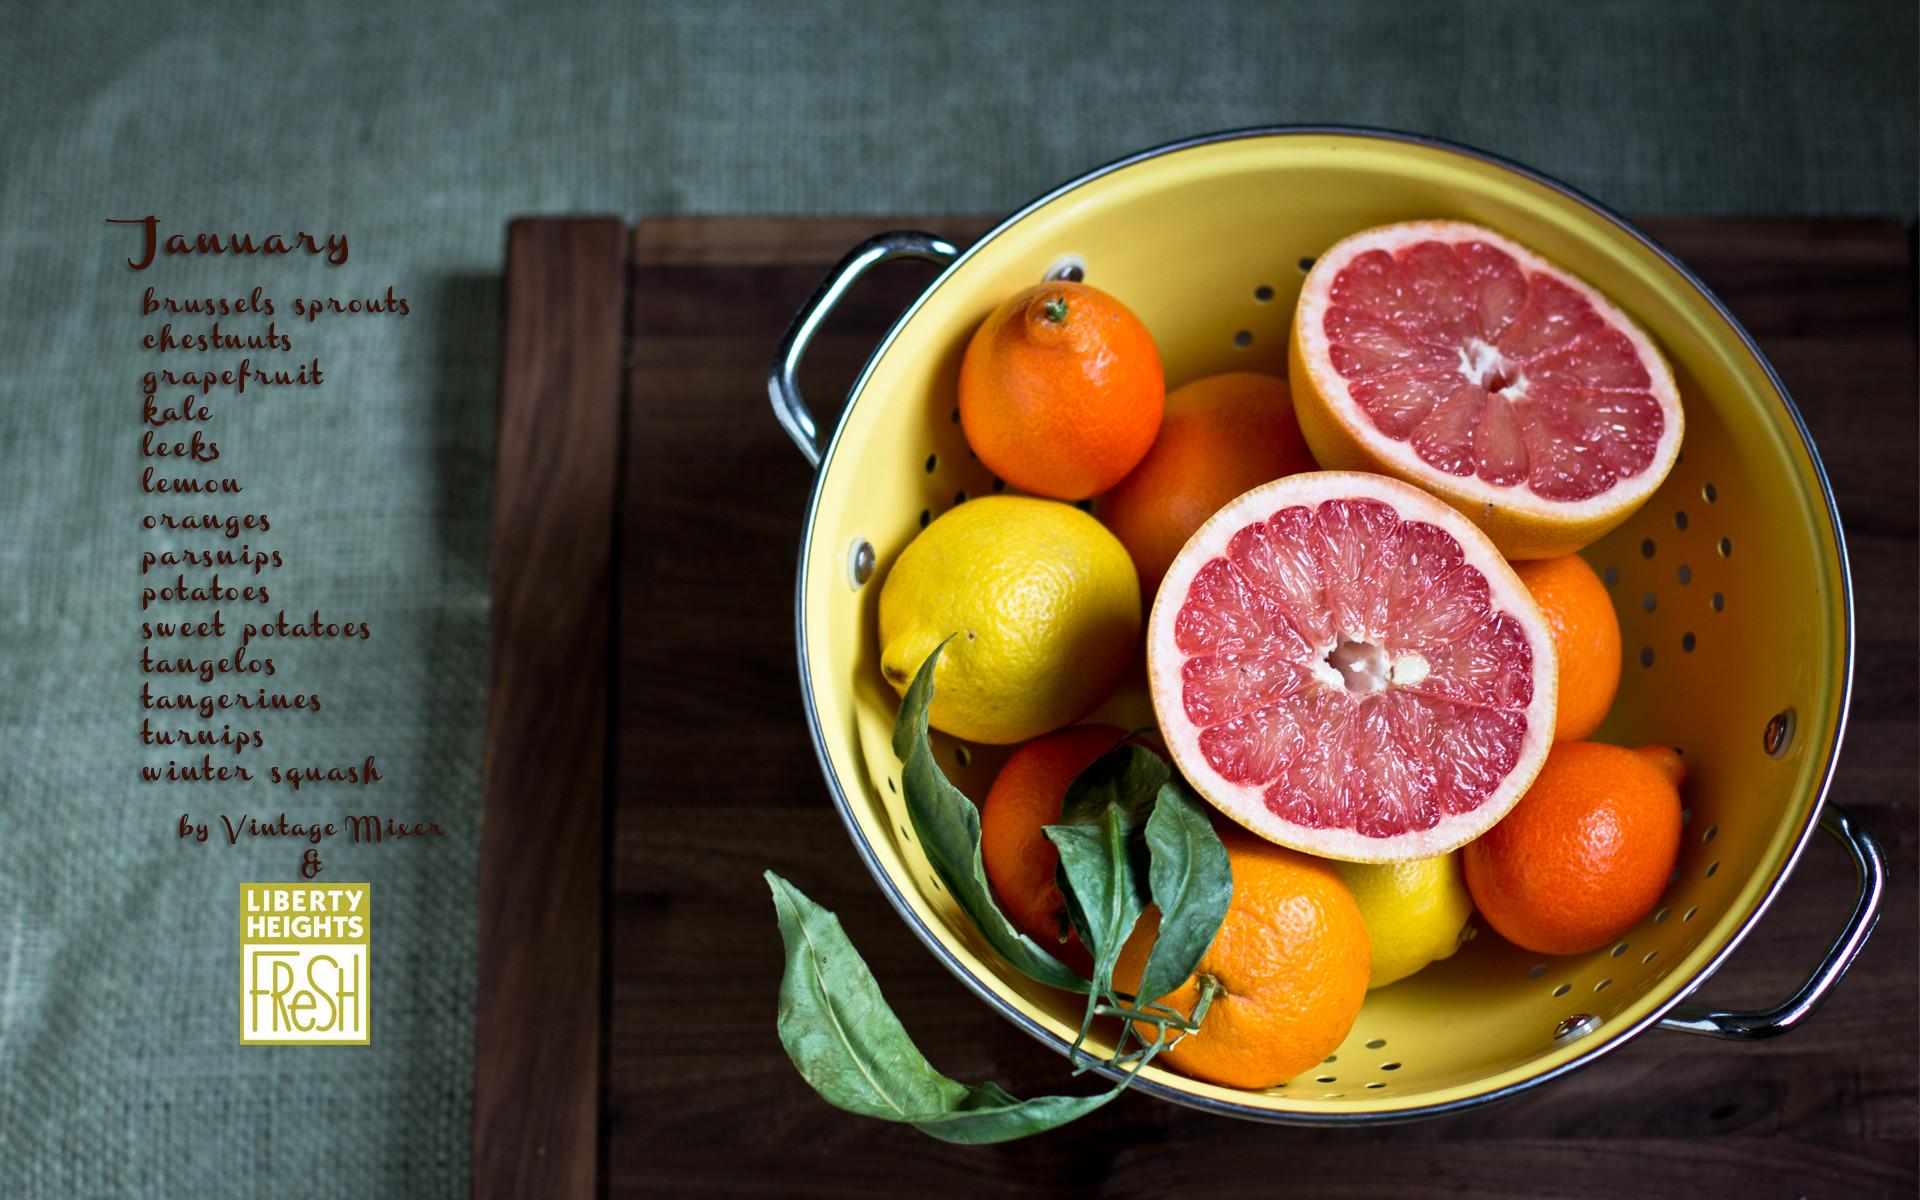 Seasonal Produce List and Wallpaper for January